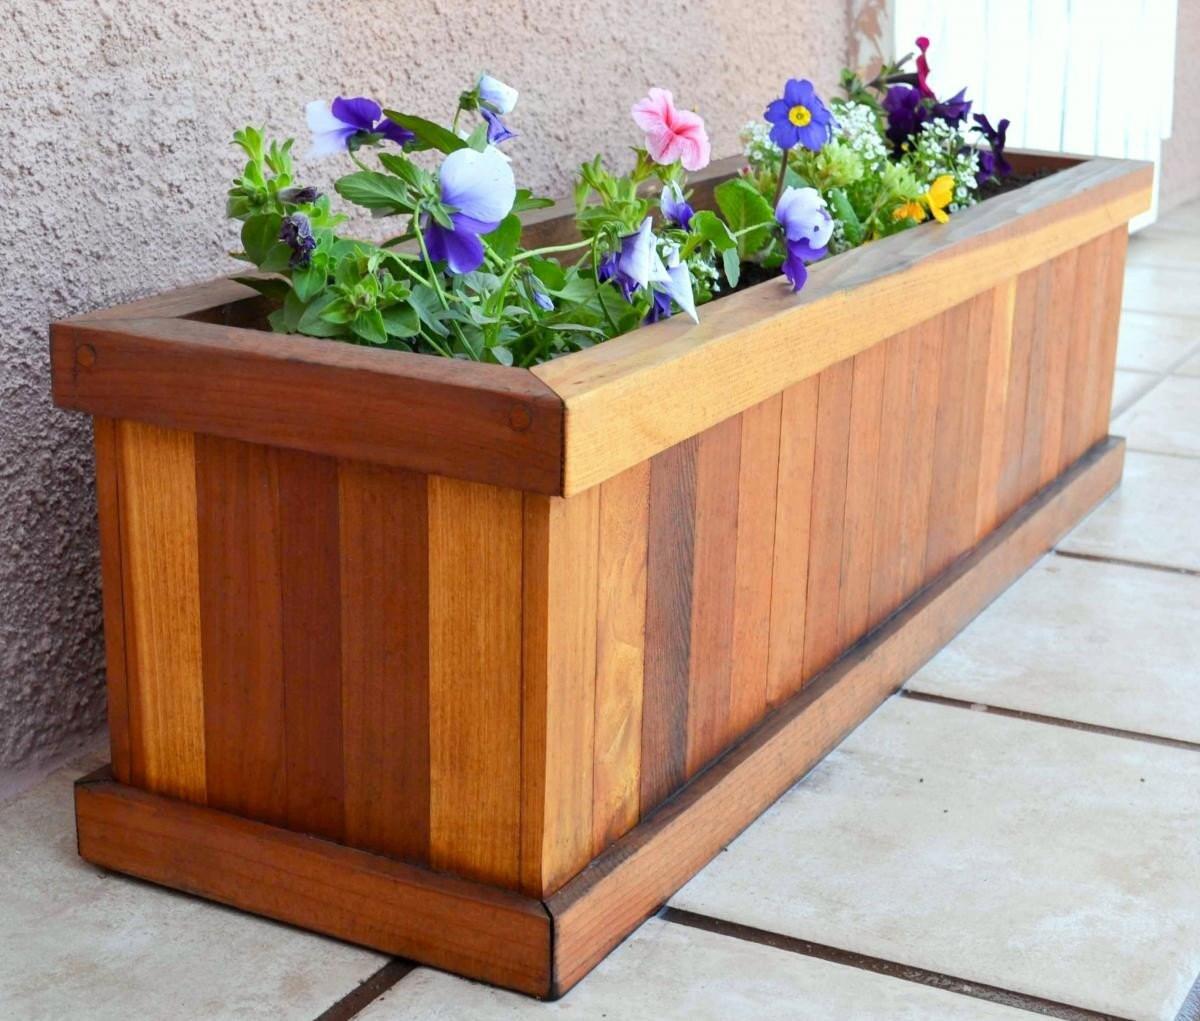 3ft Redwood Flower Planter Box For Windows By Redwoodgardens